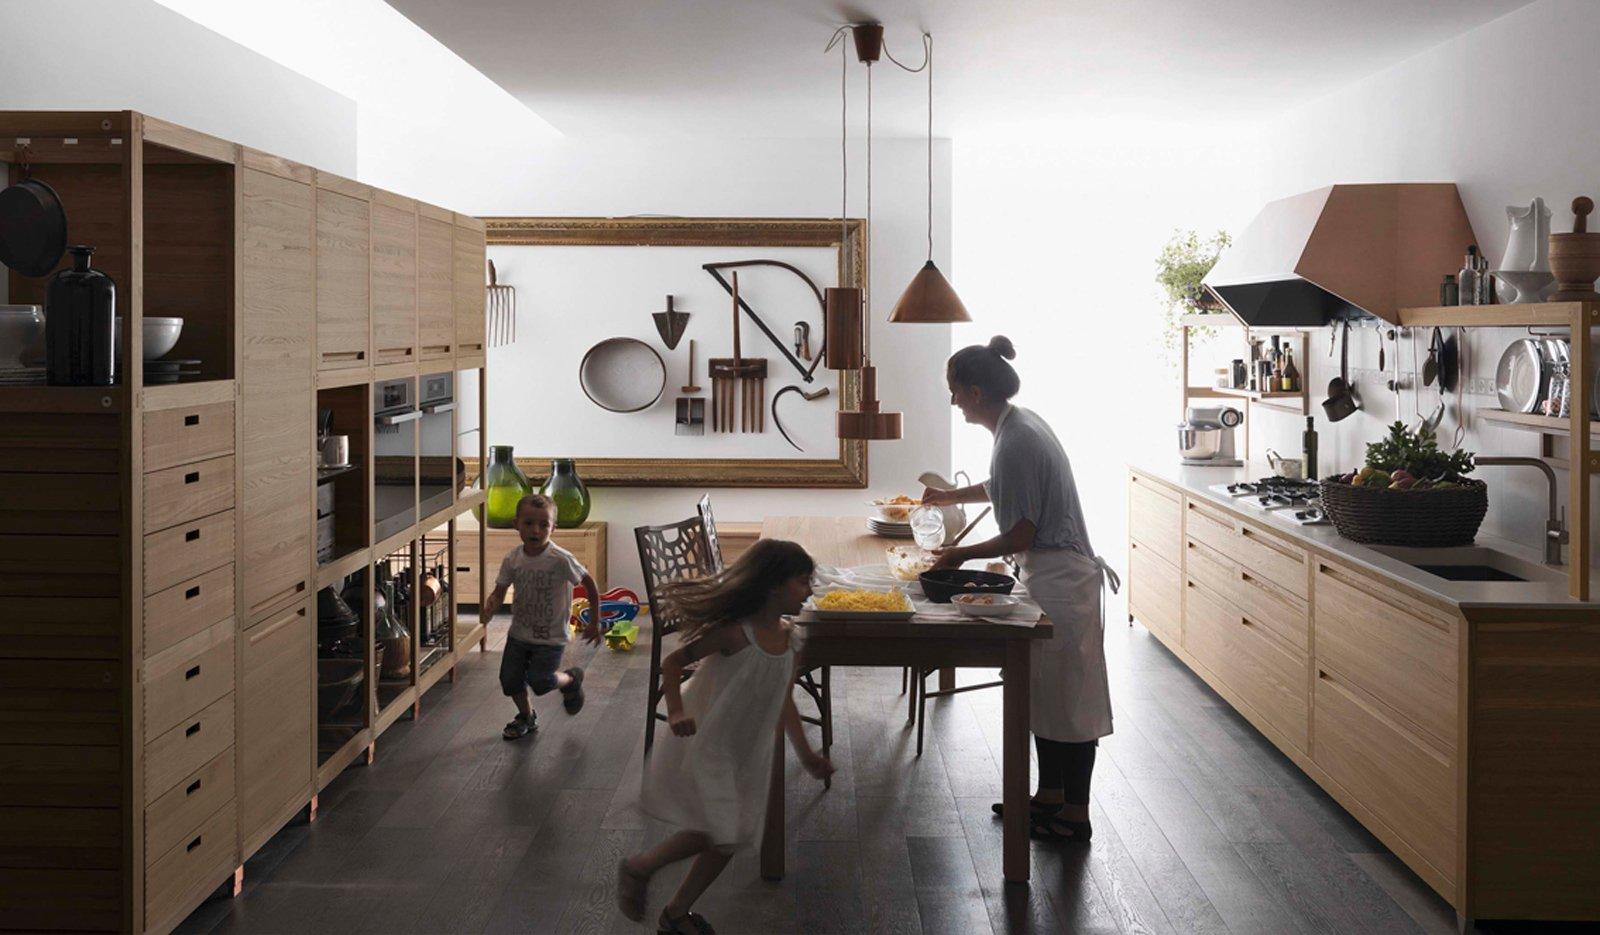 Cucina in legno moderna o classica cose di casa for Registra i prezzi dei piani di casa